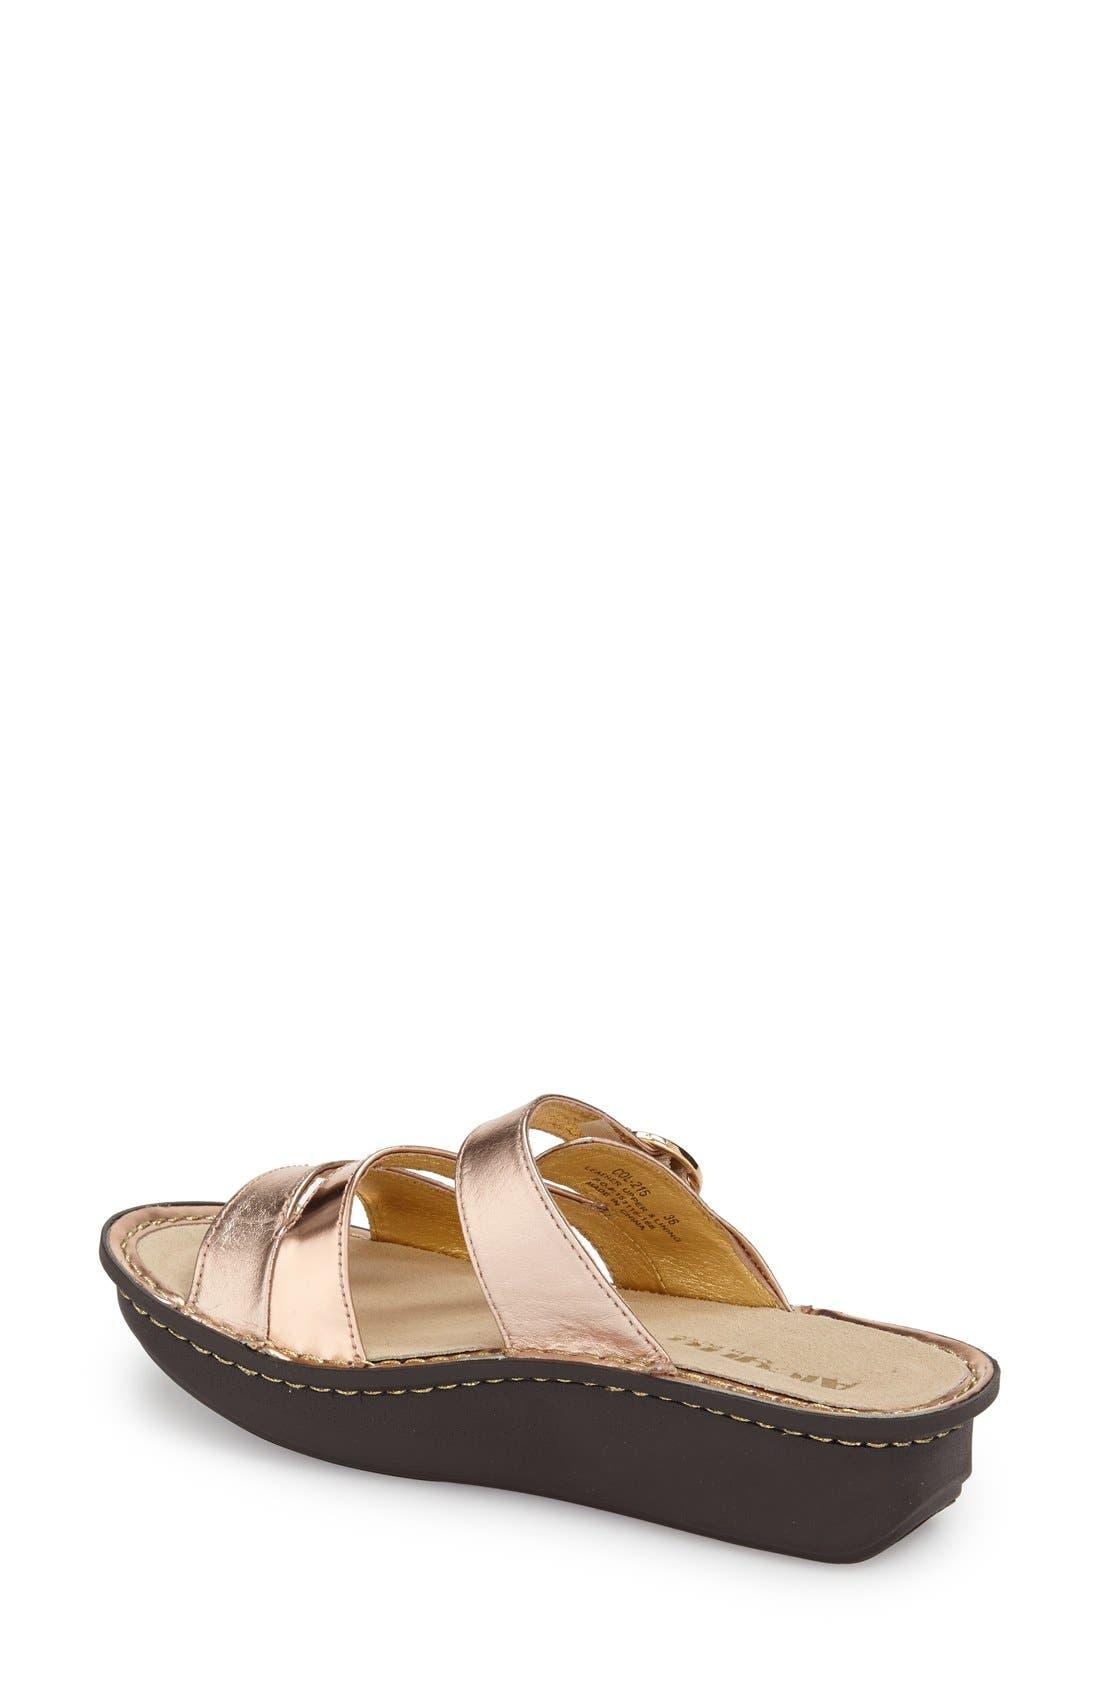 'Colette' Platform Sandal,                             Alternate thumbnail 40, color,